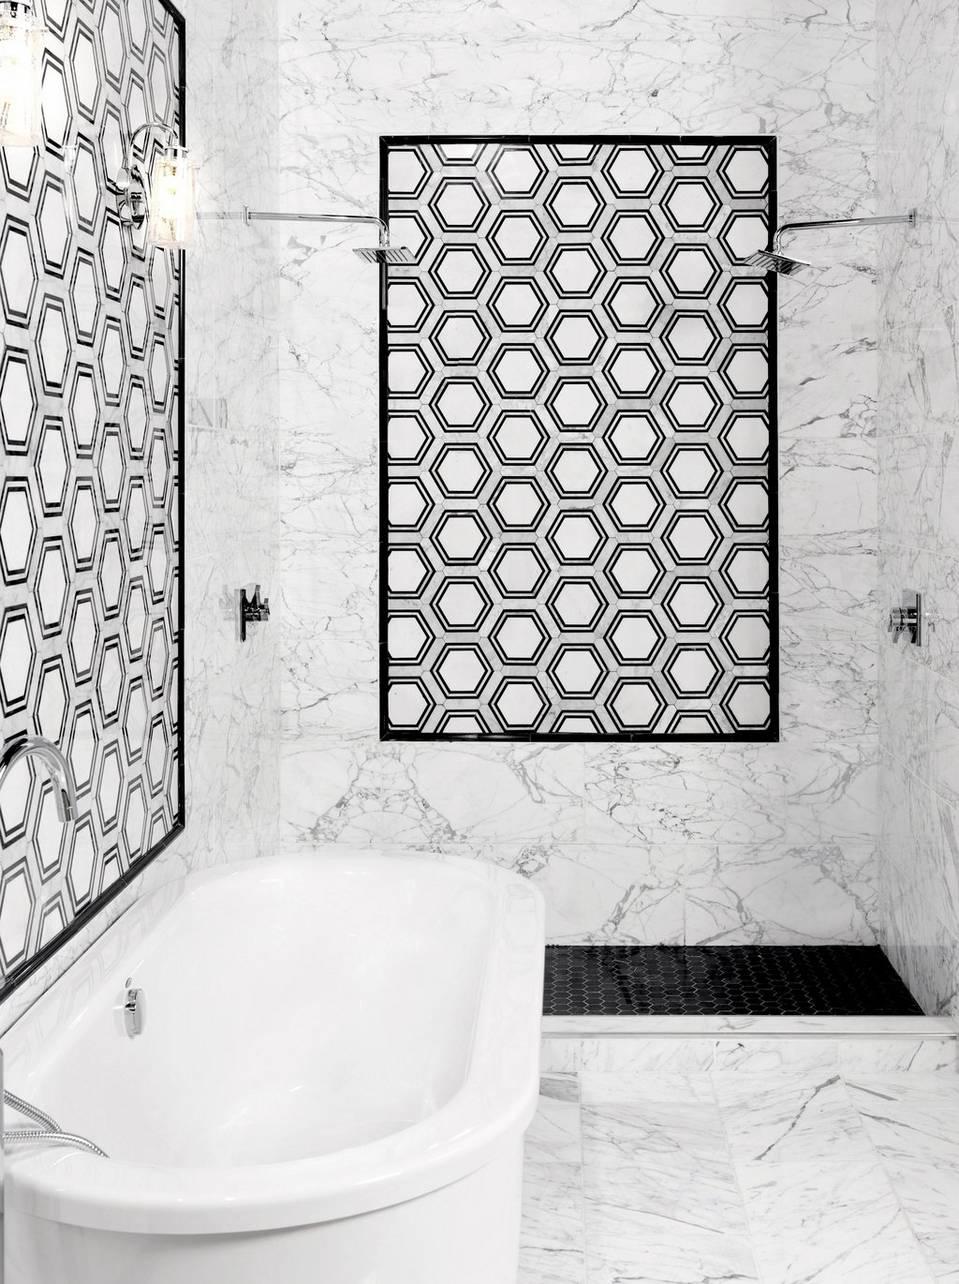 Viviano Marmo Carrara Thassos Hexagon Waterjet Marble Mosaic